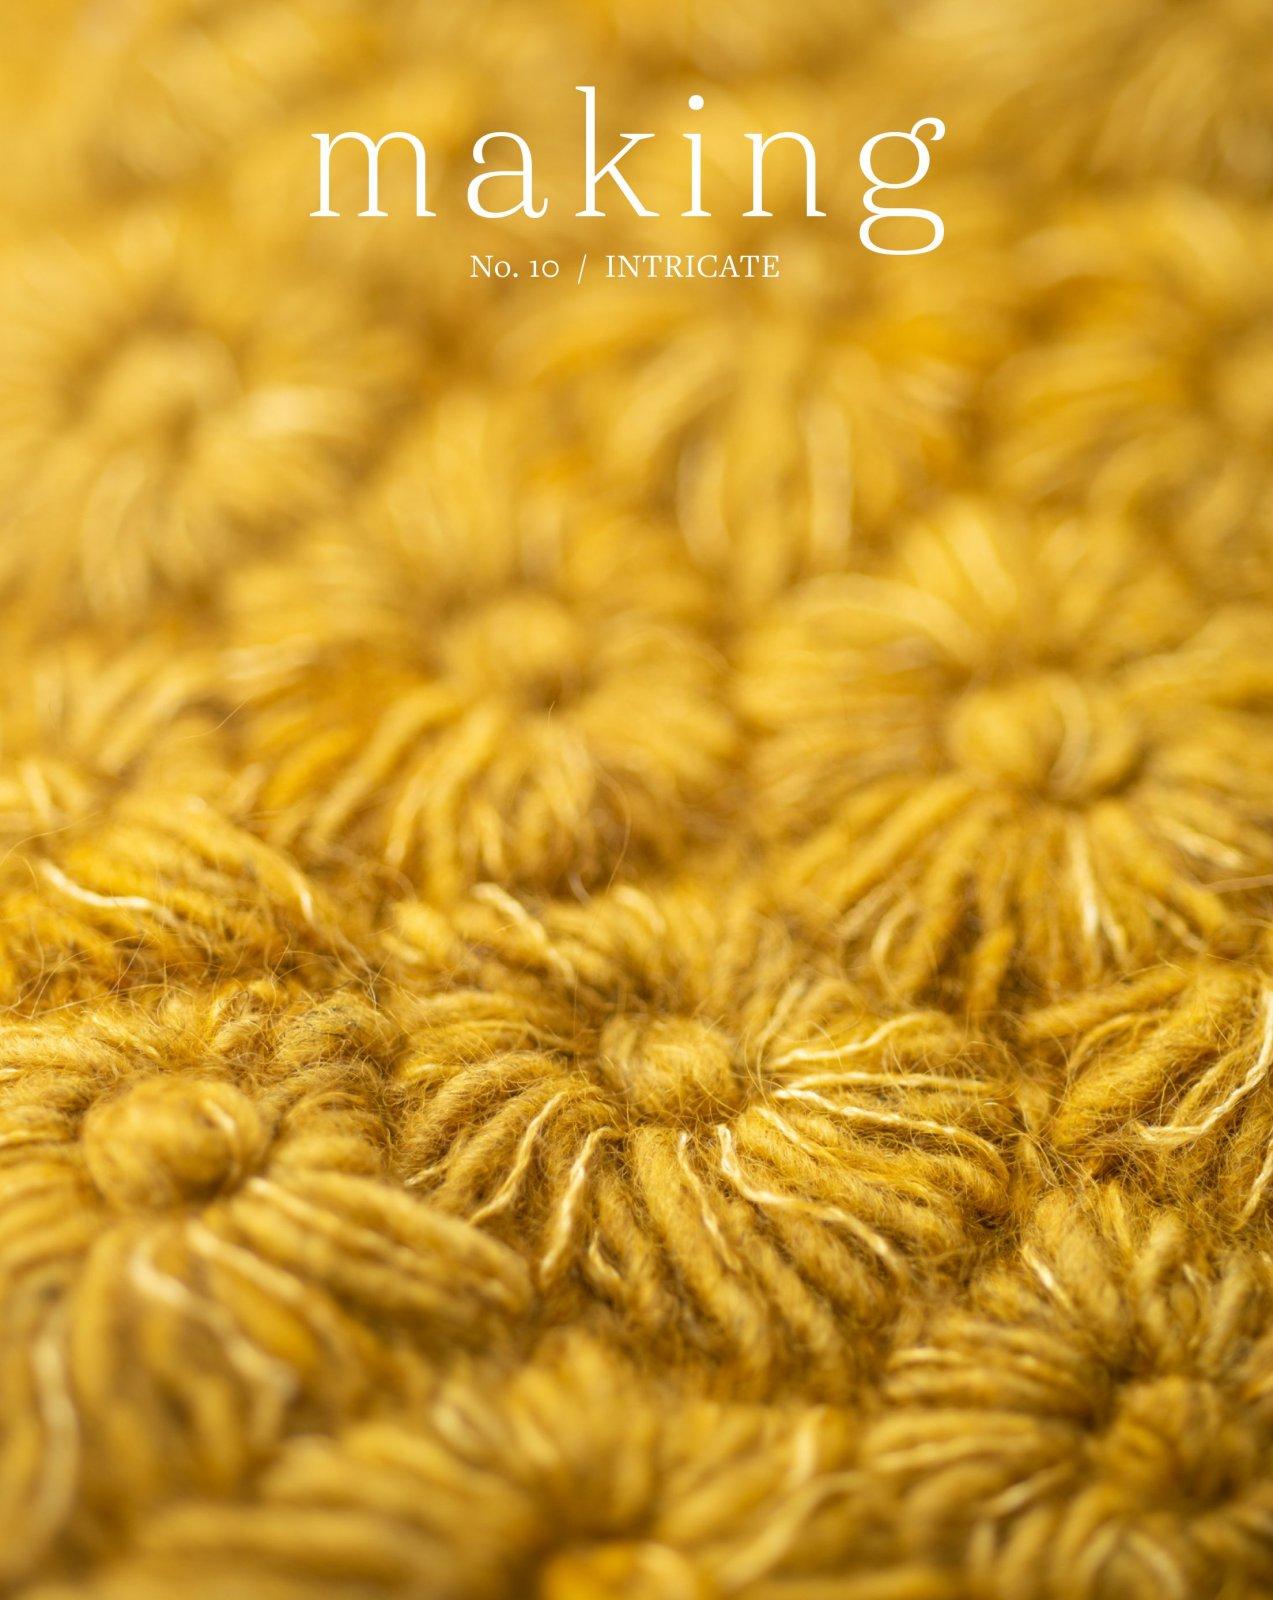 Making No.10 - Intricate